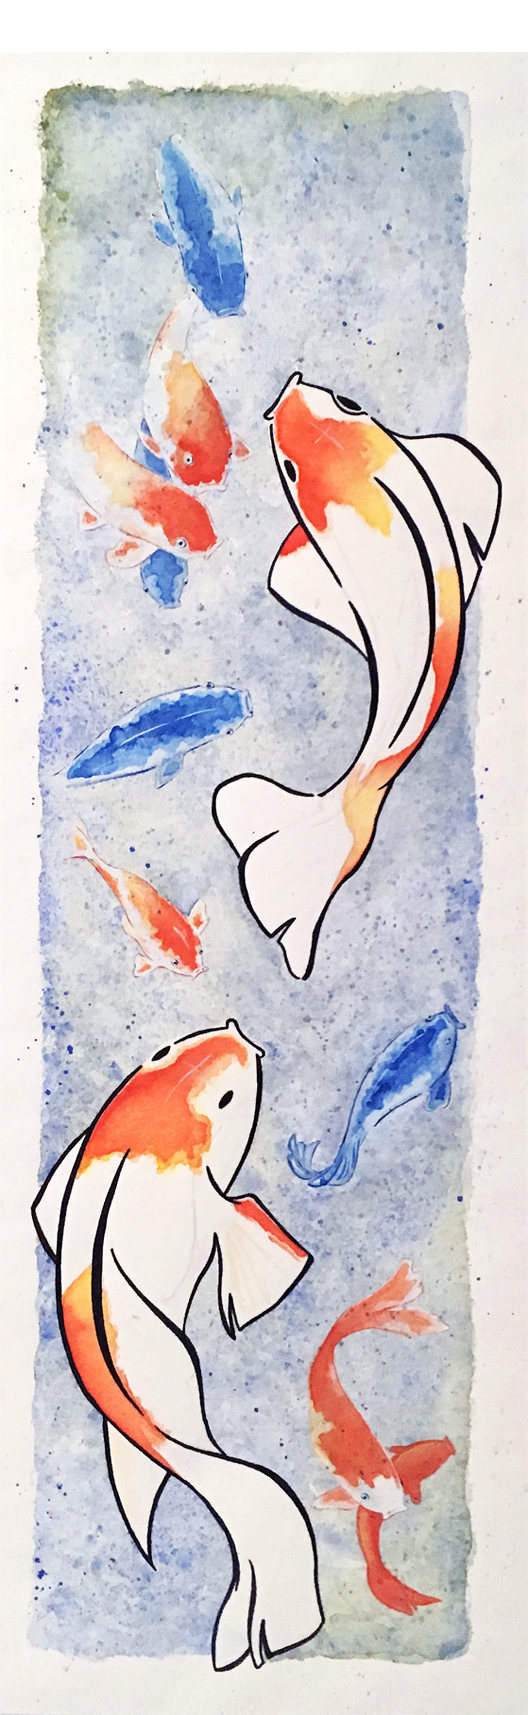 waterfish_3